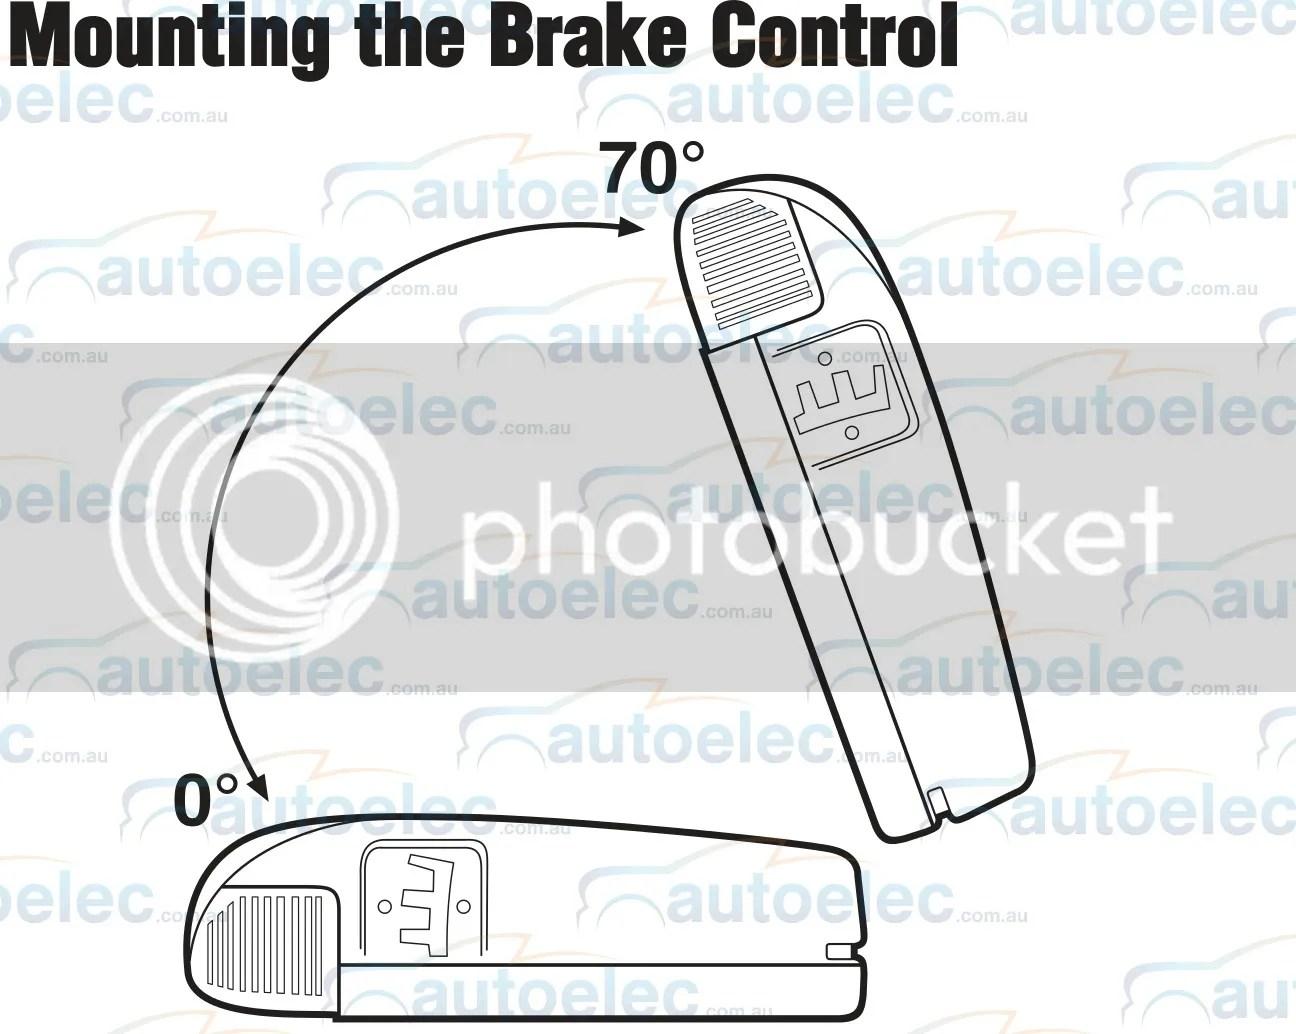 boat trailer wiring diagram with brakes motorhome tekonsha primus iq electric brake controller